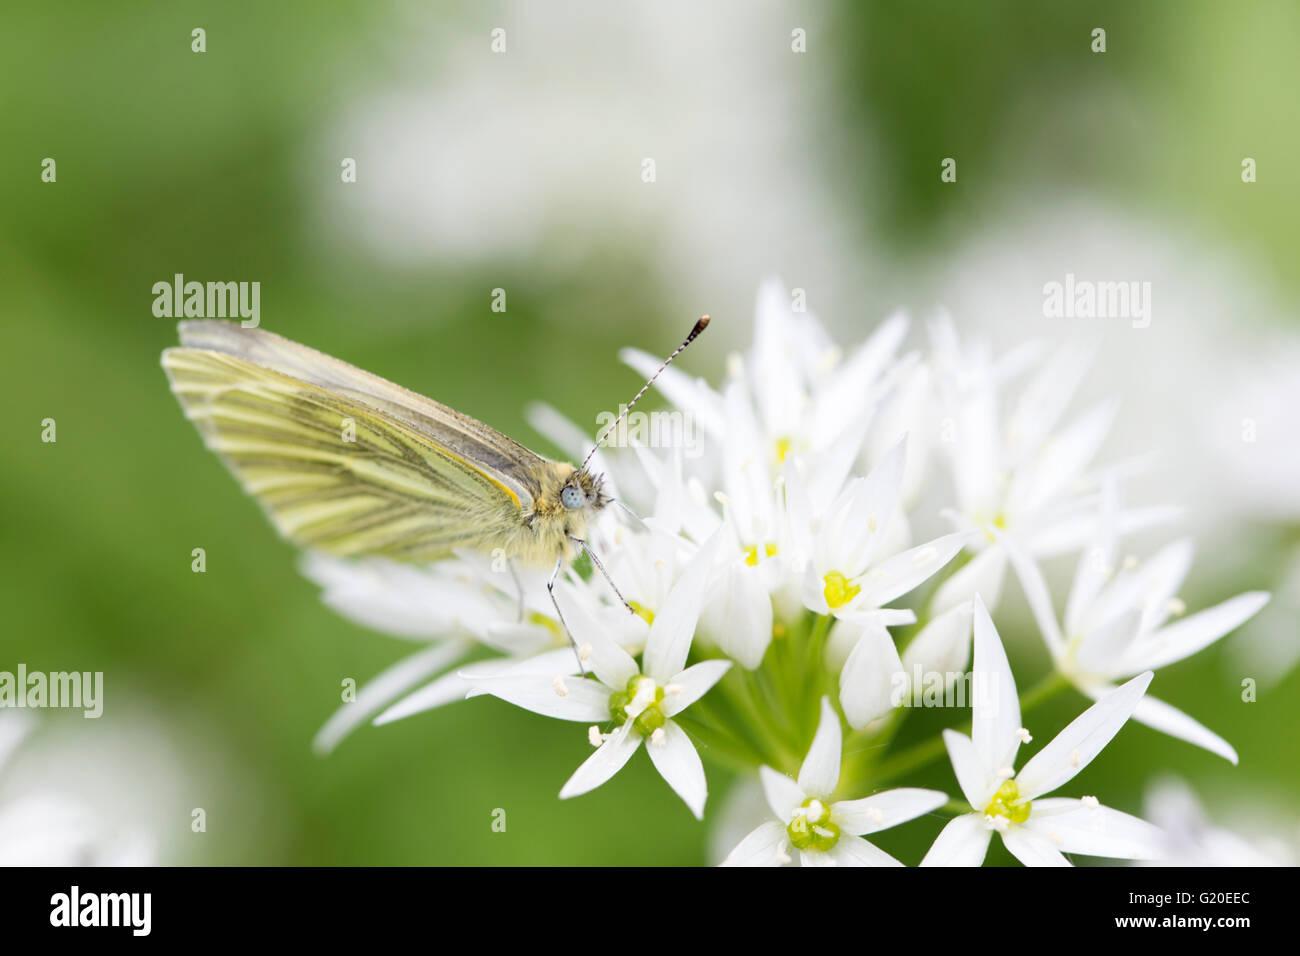 Green-veined white (Pieris napi) Butterfly on Ramsons (Allium ursinum) flower head, England, UK - Stock Image